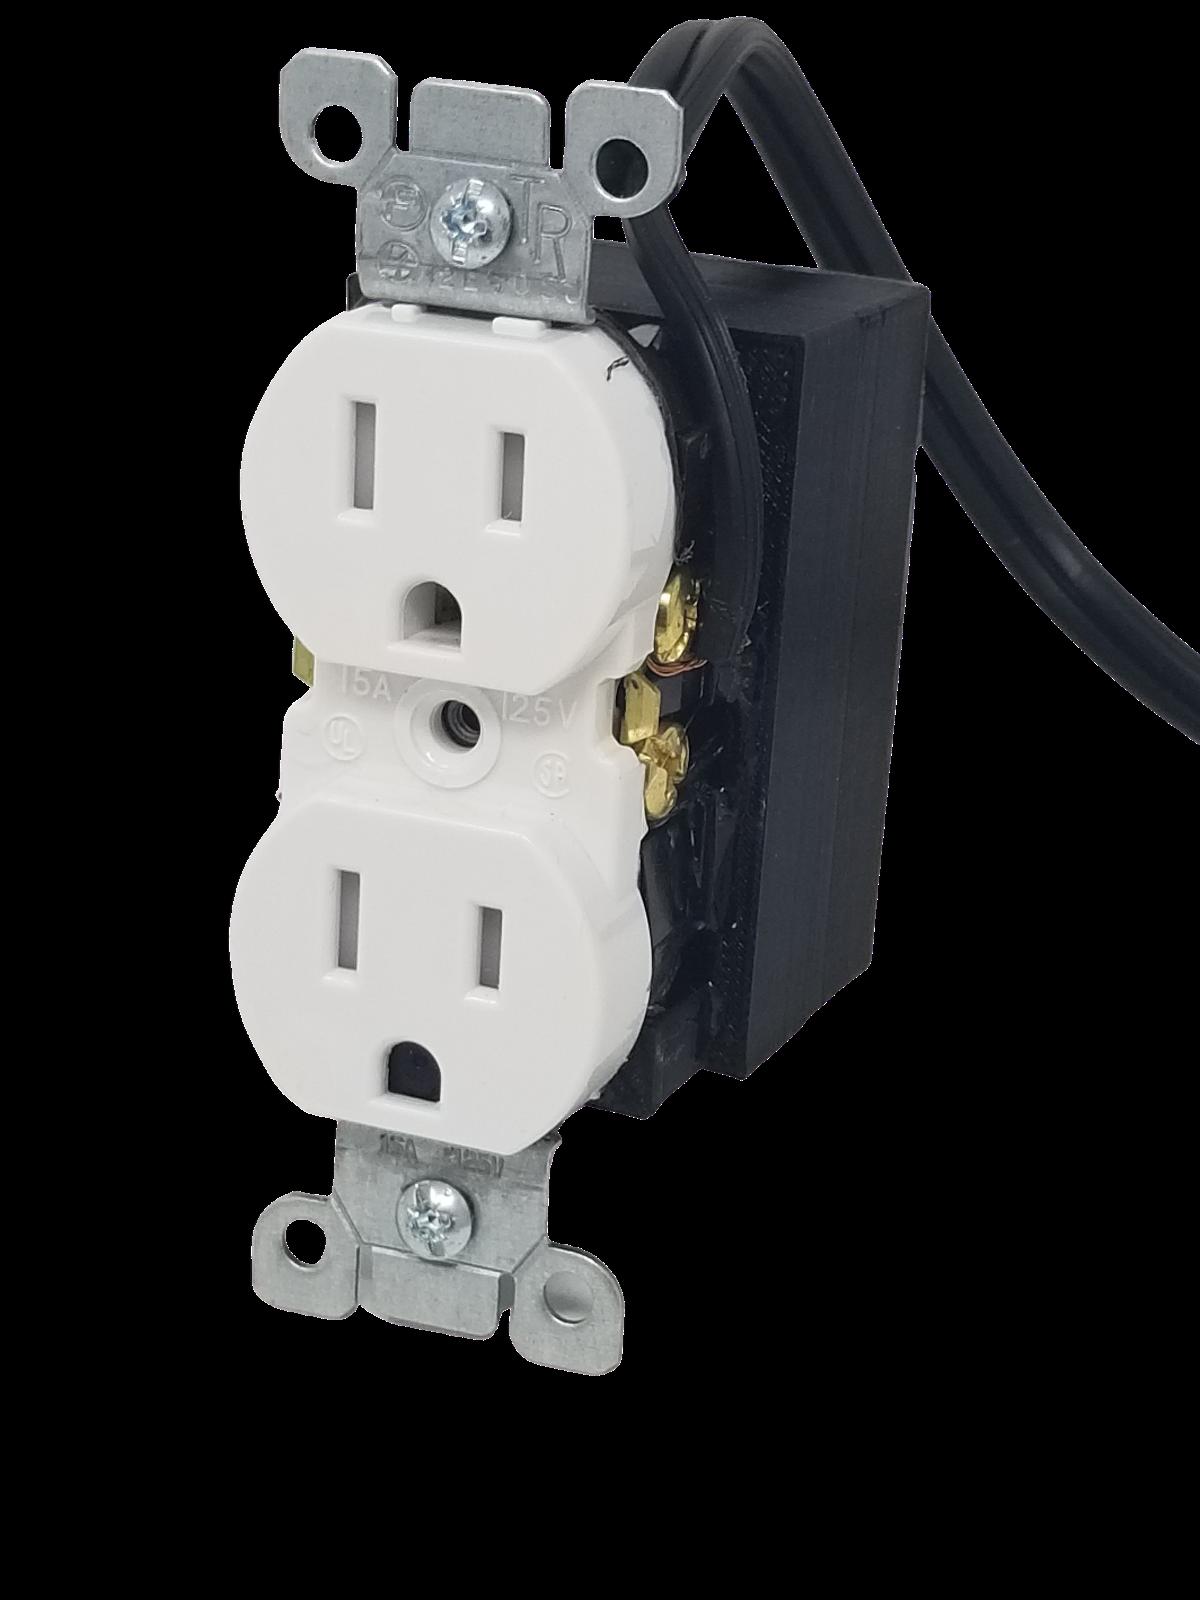 Image result for outlet